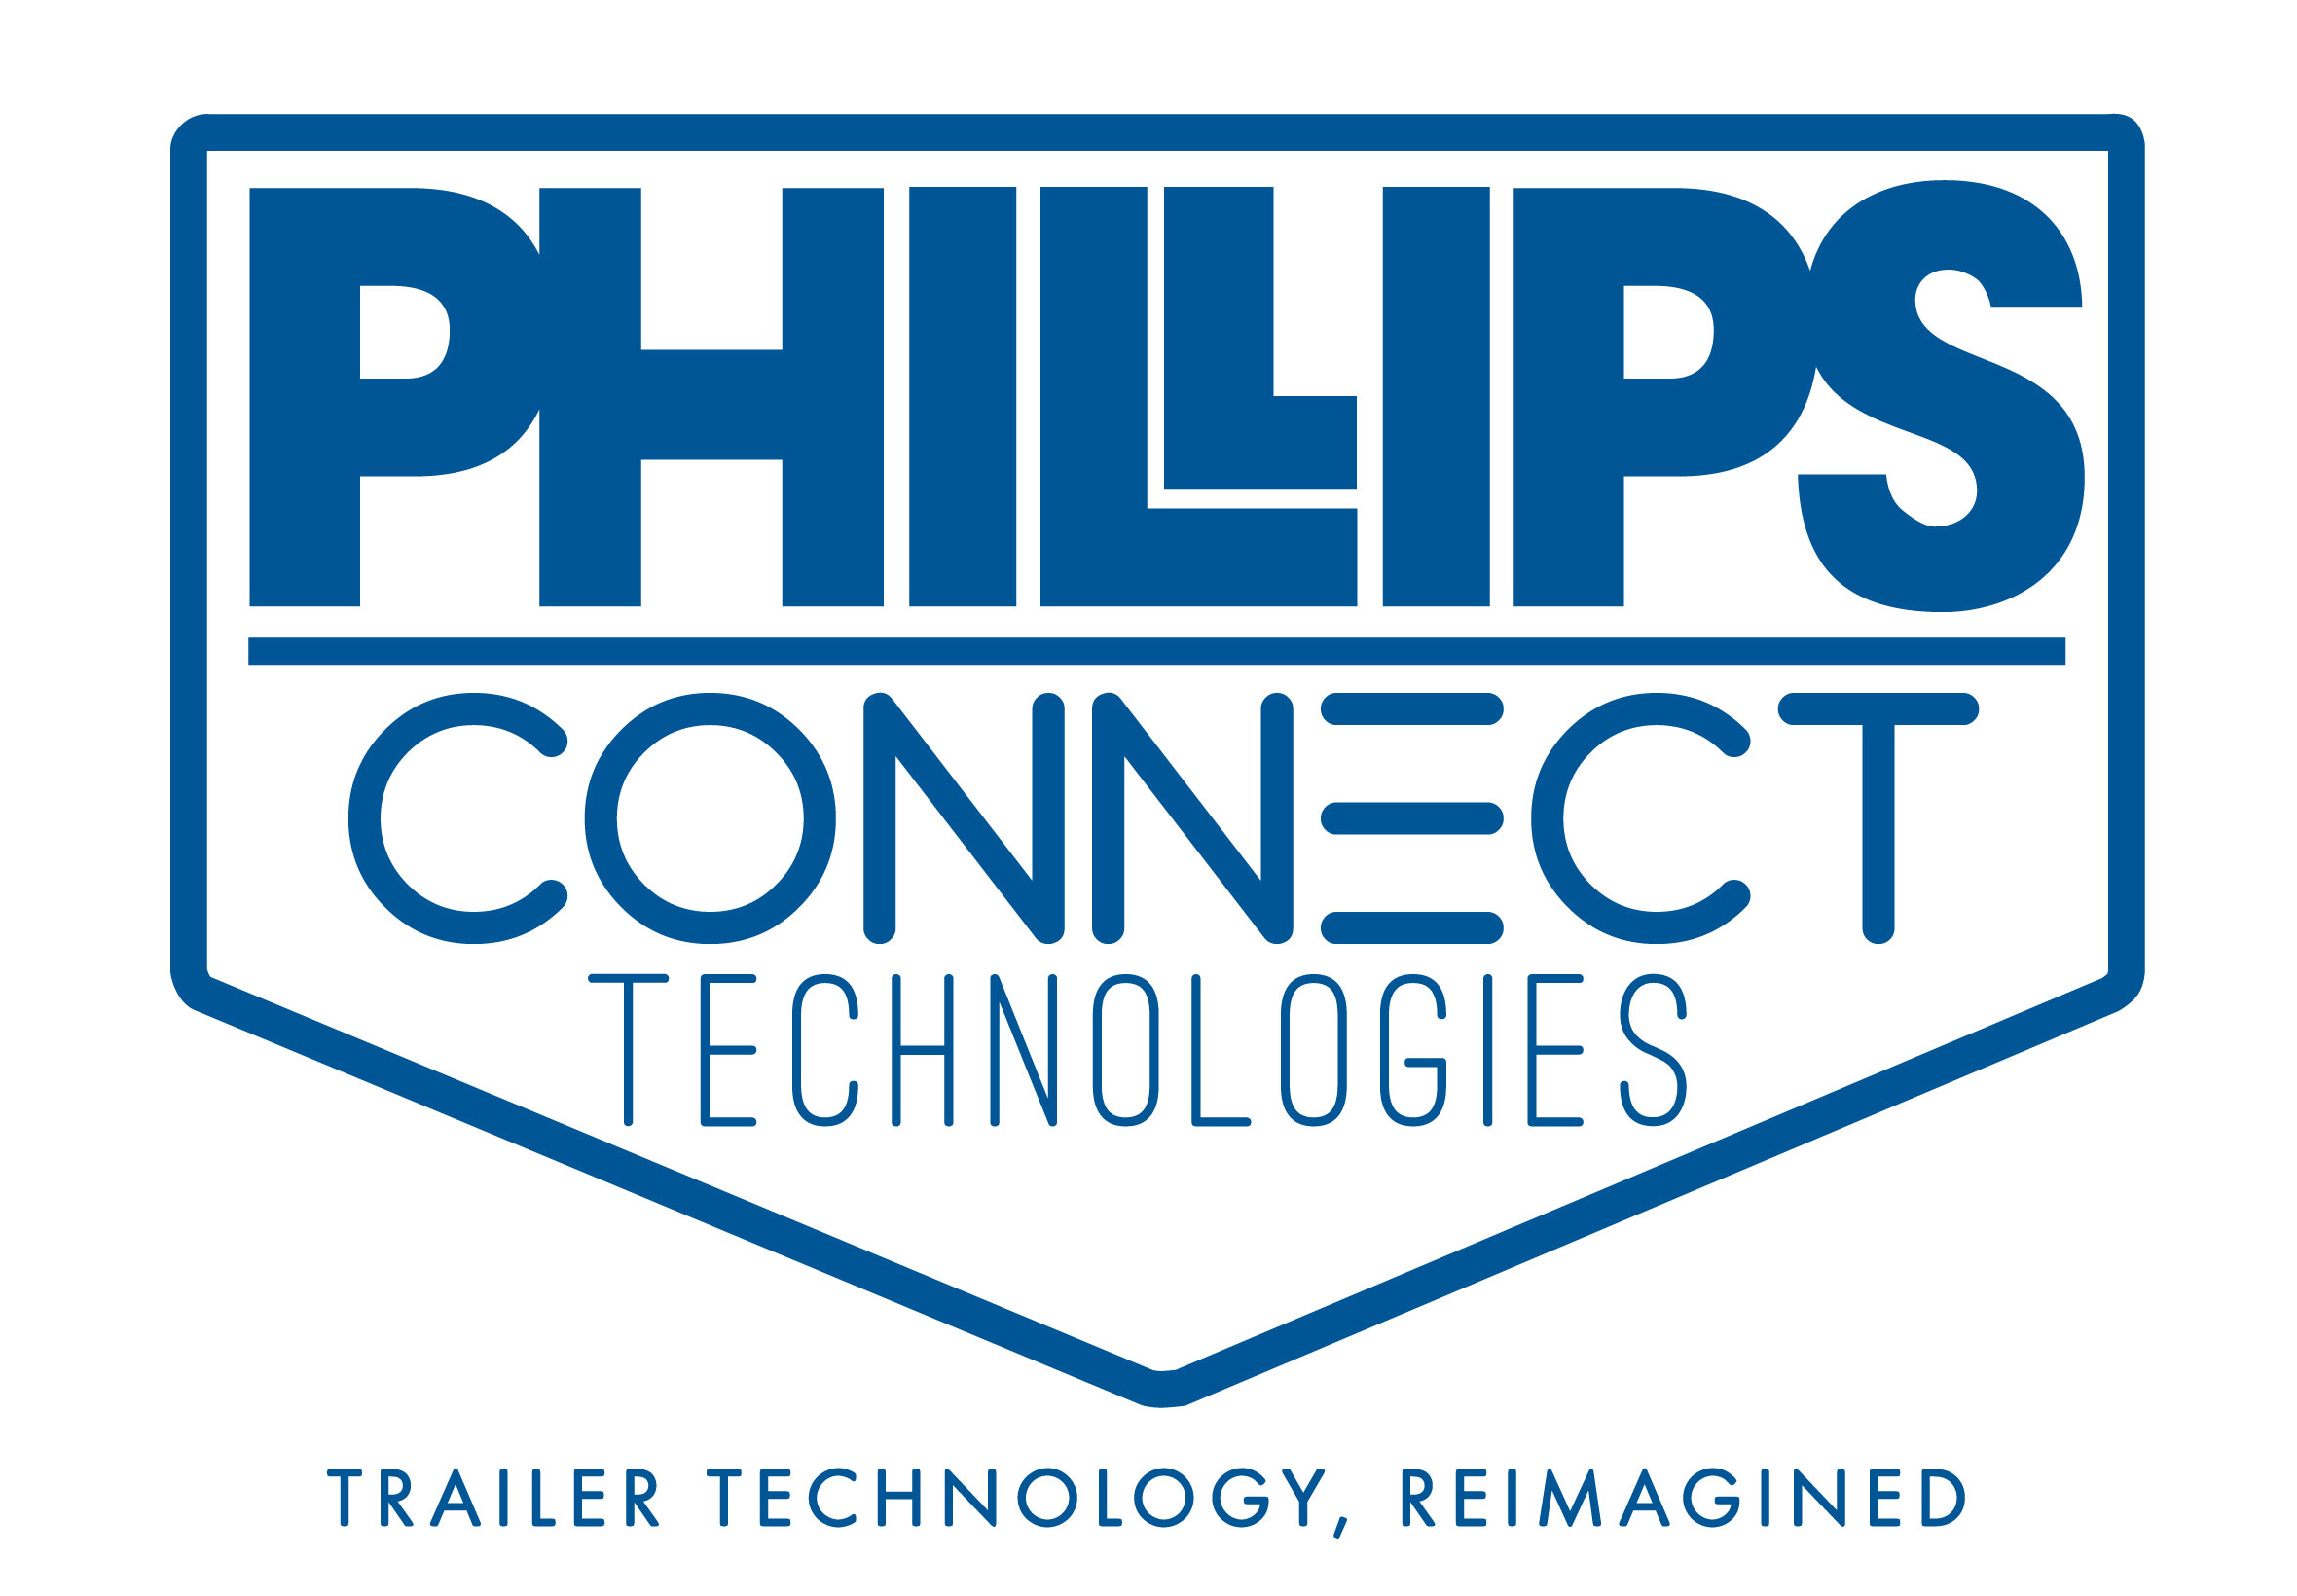 PCT-Phillips Connect Technologies.jpg